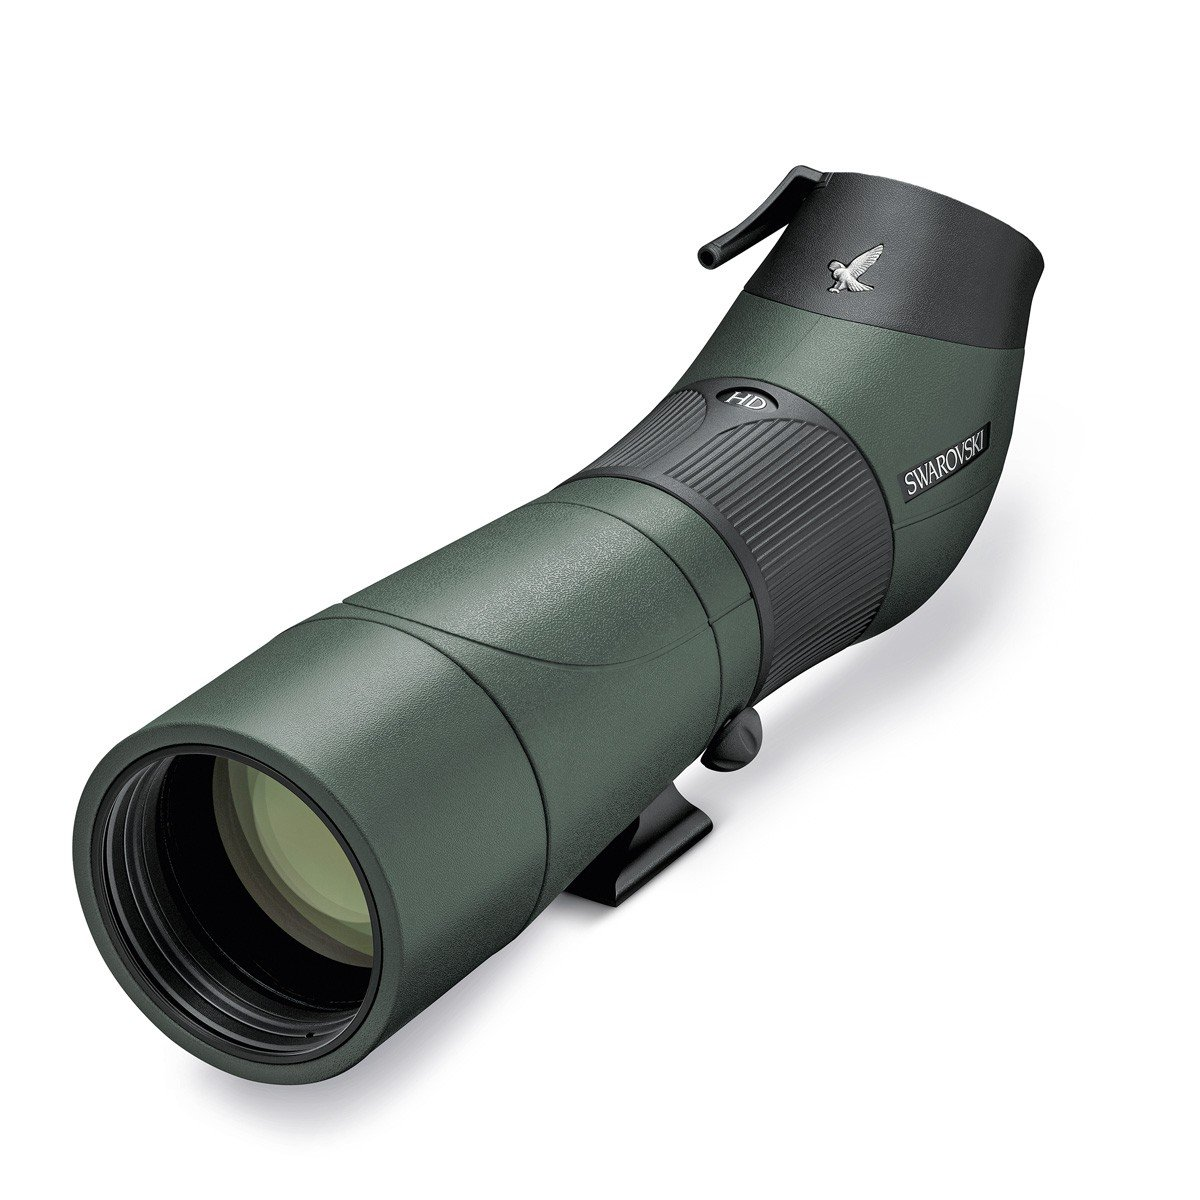 Swarovski Spotting Scope HD ATS-65 High Definition Glass (Eyepiece sold separately)